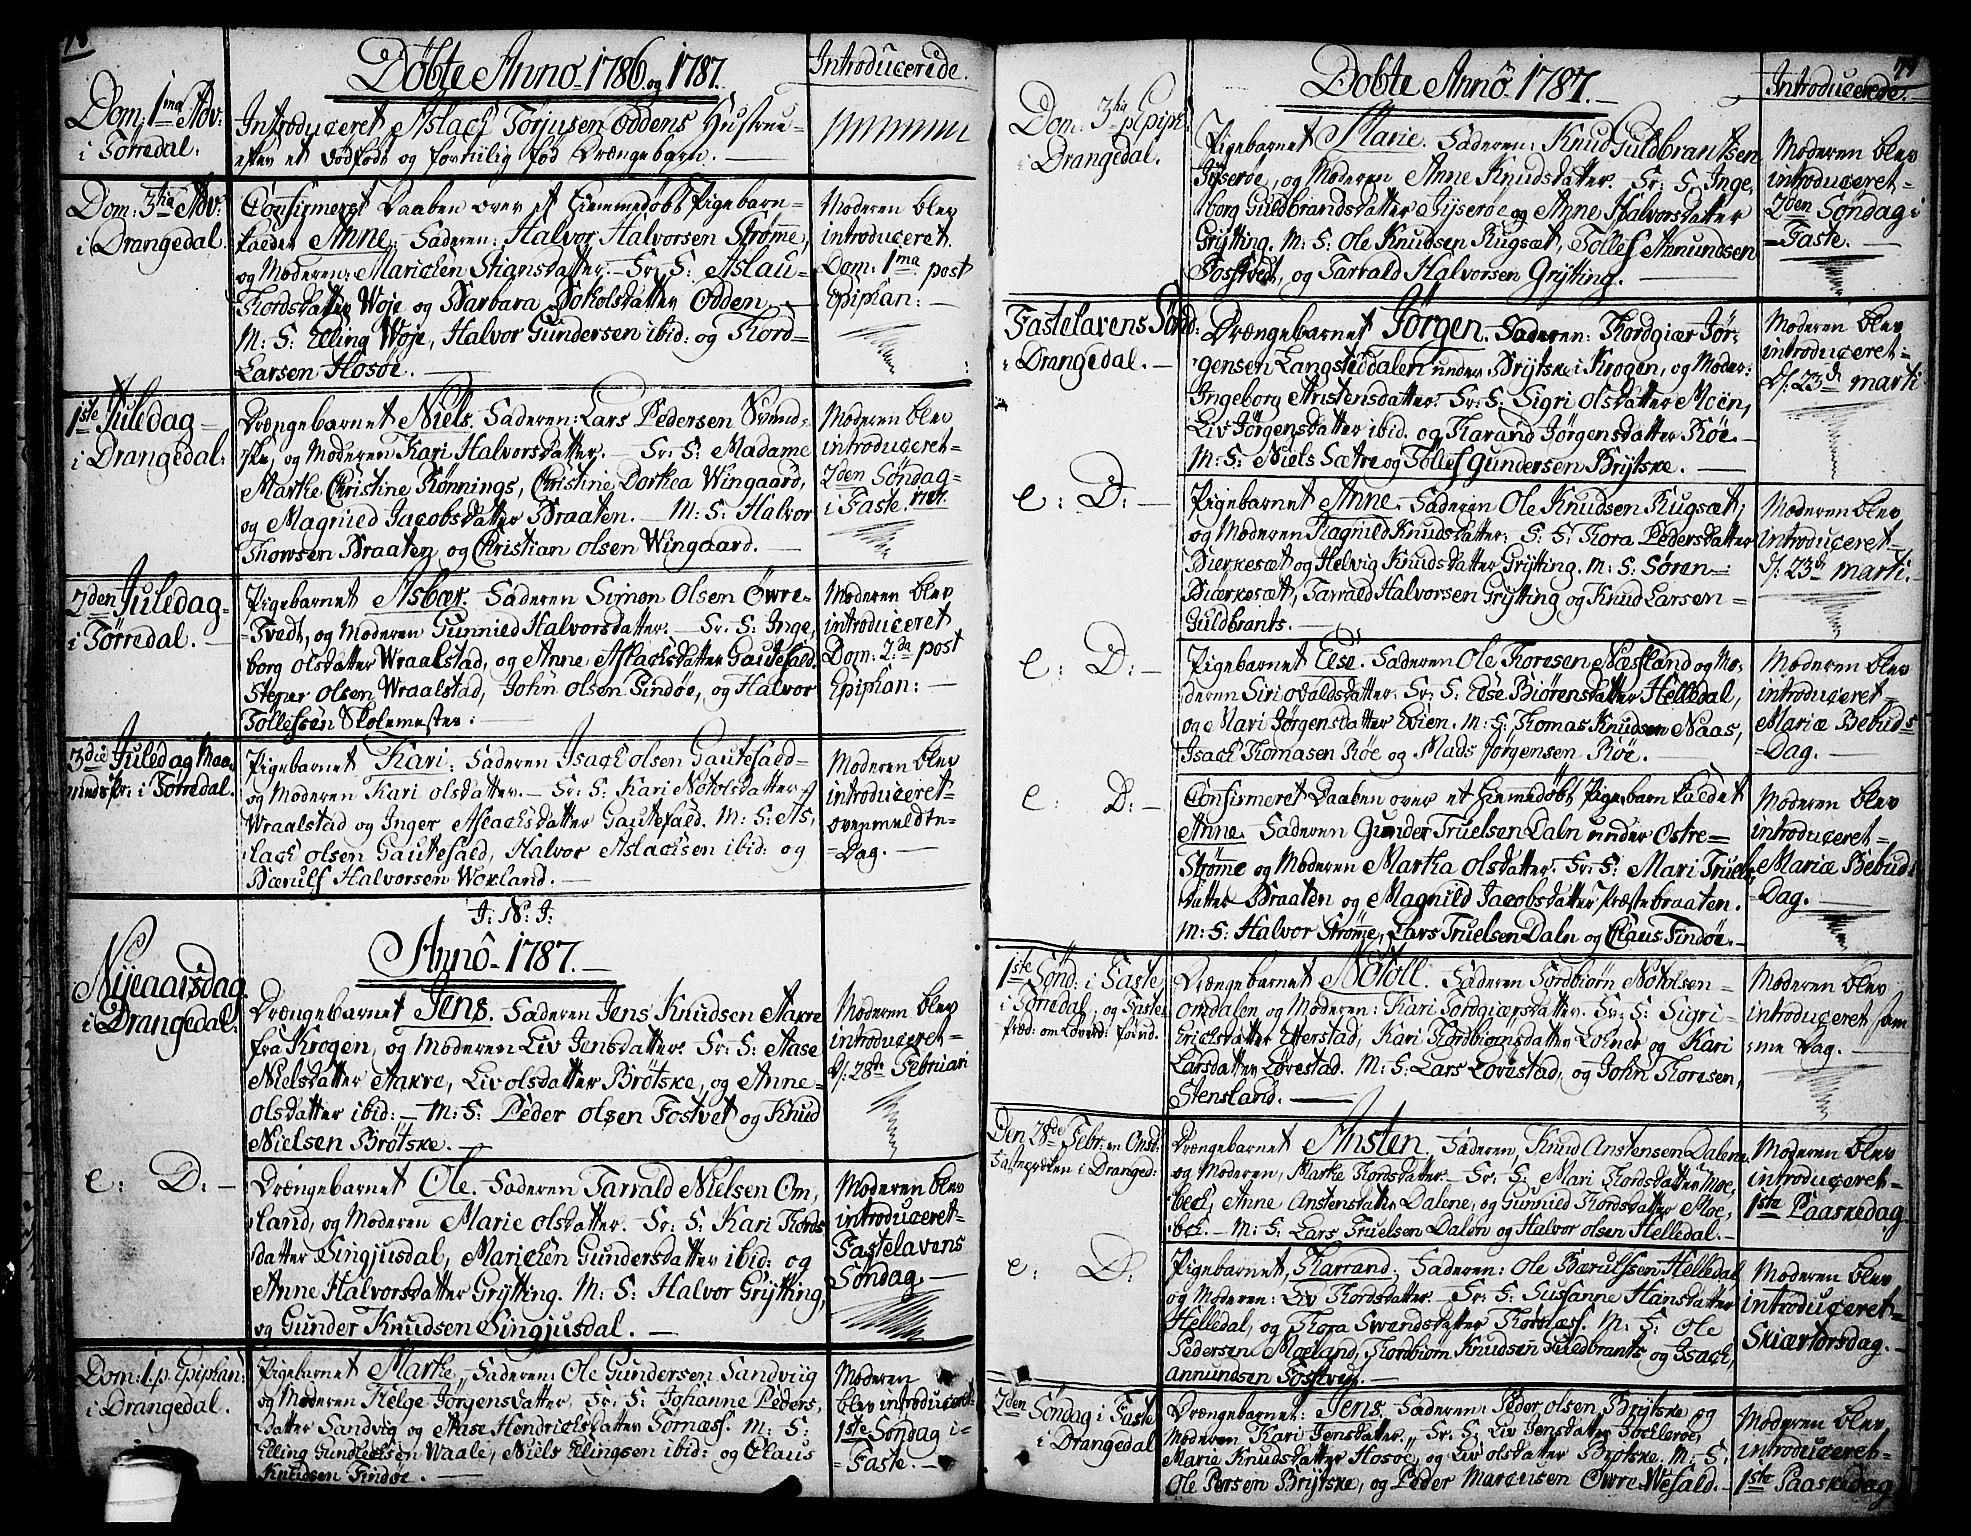 SAKO, Drangedal kirkebøker, F/Fa/L0003: Ministerialbok nr. 3, 1768-1814, s. 78-79